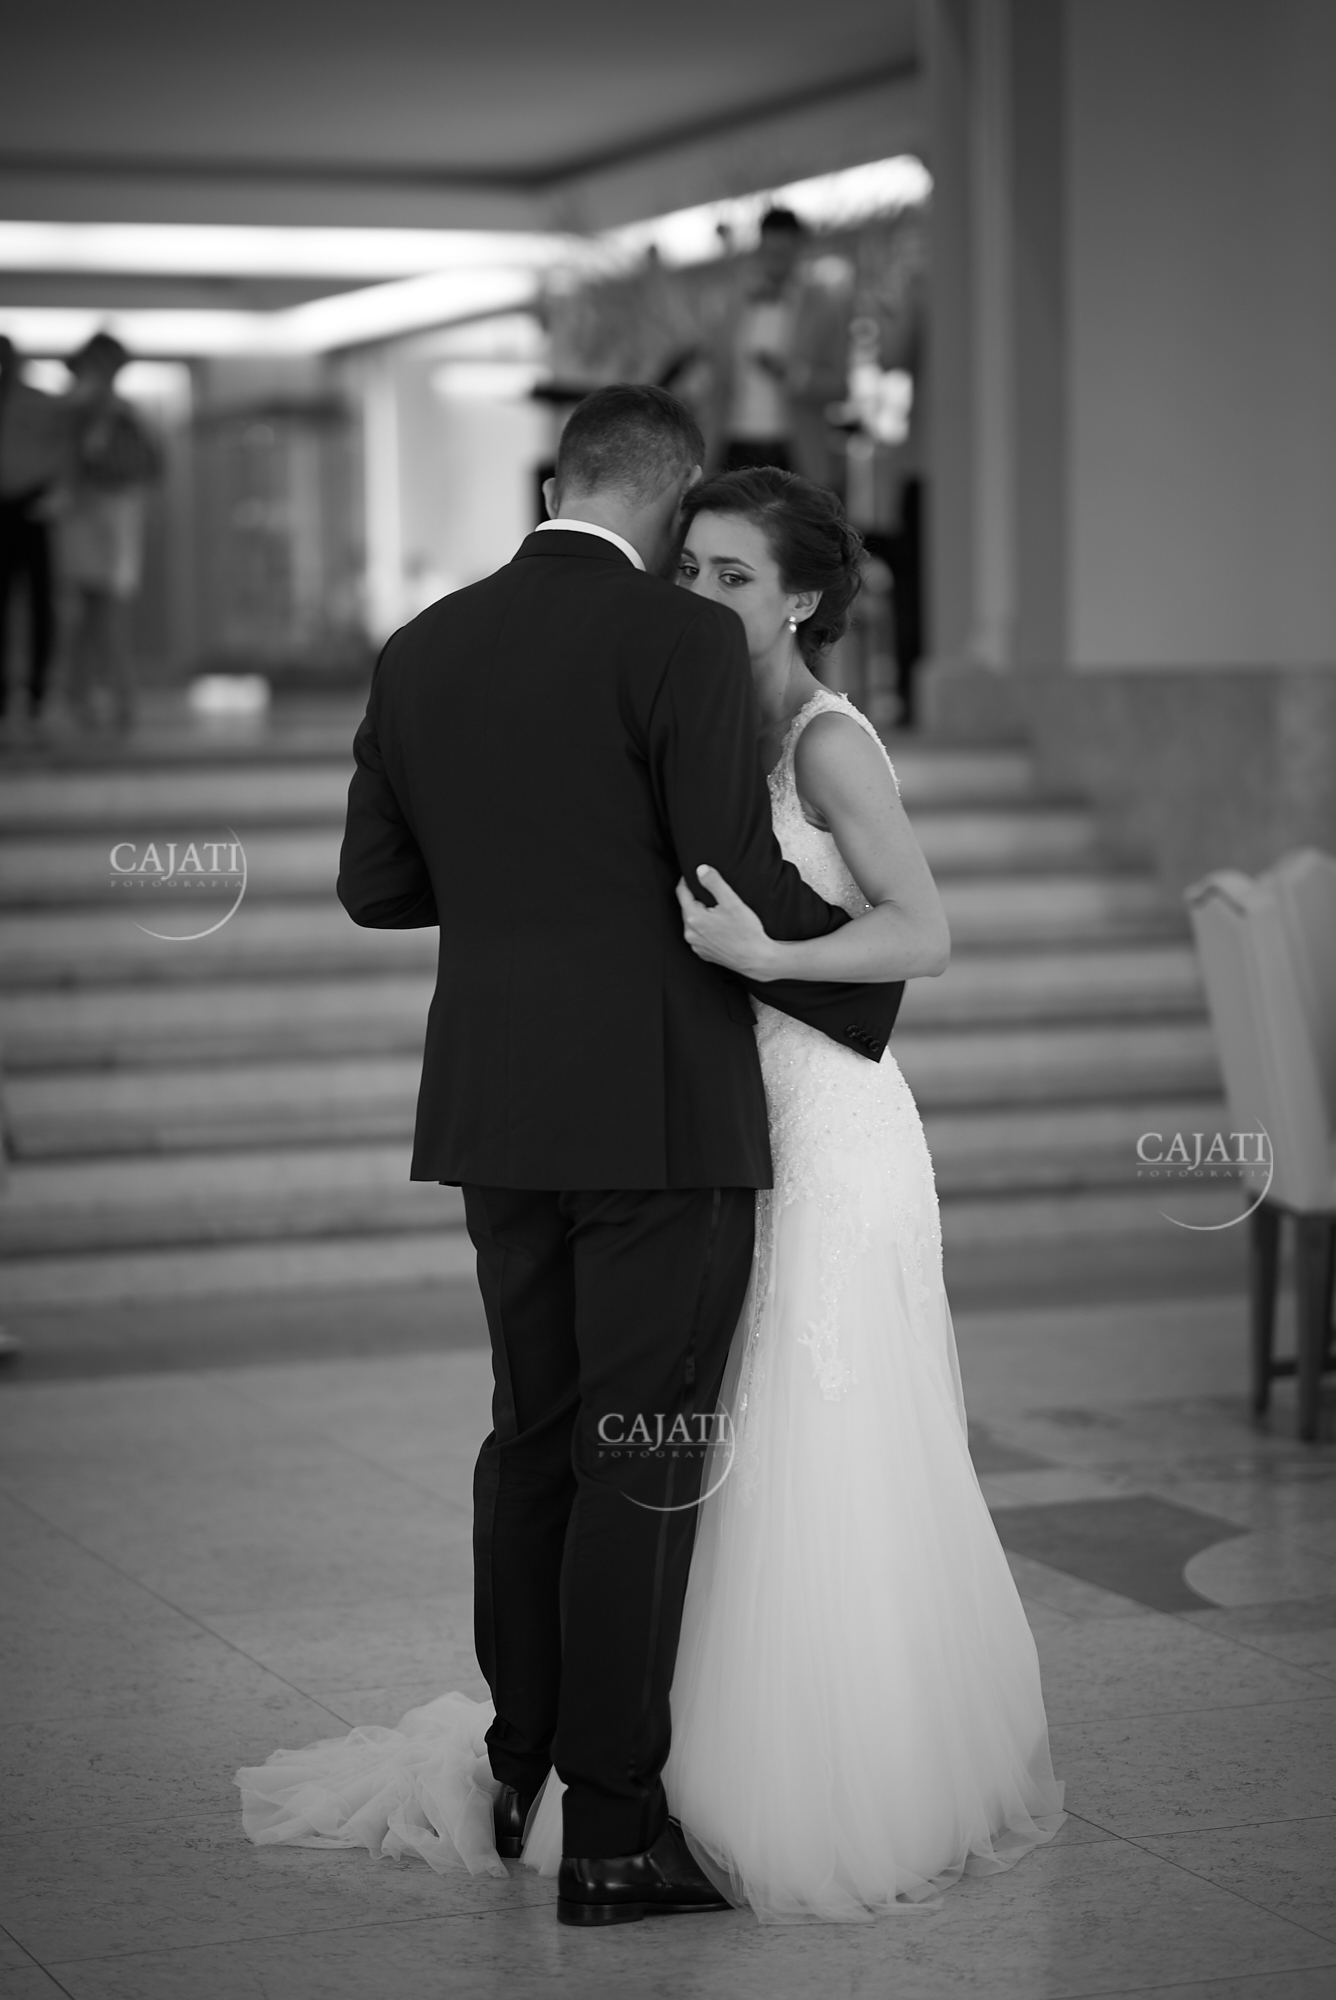 blog,- [x] #wedding #weddingstyle #weddingday #matrimonio #fashion #sposi #mariage #weddinginspirations #weddingideas #photowedding #instabride#love #instadaily #photooftheday #bestoftheday #picoftheday #photoshoot #igersnapoli #Sposa #weddingdress #bridal #bride #bridalcouture #cajatifotografia #sposa #italianphotographer #weddingdecor #weddingplanner #bridetobe